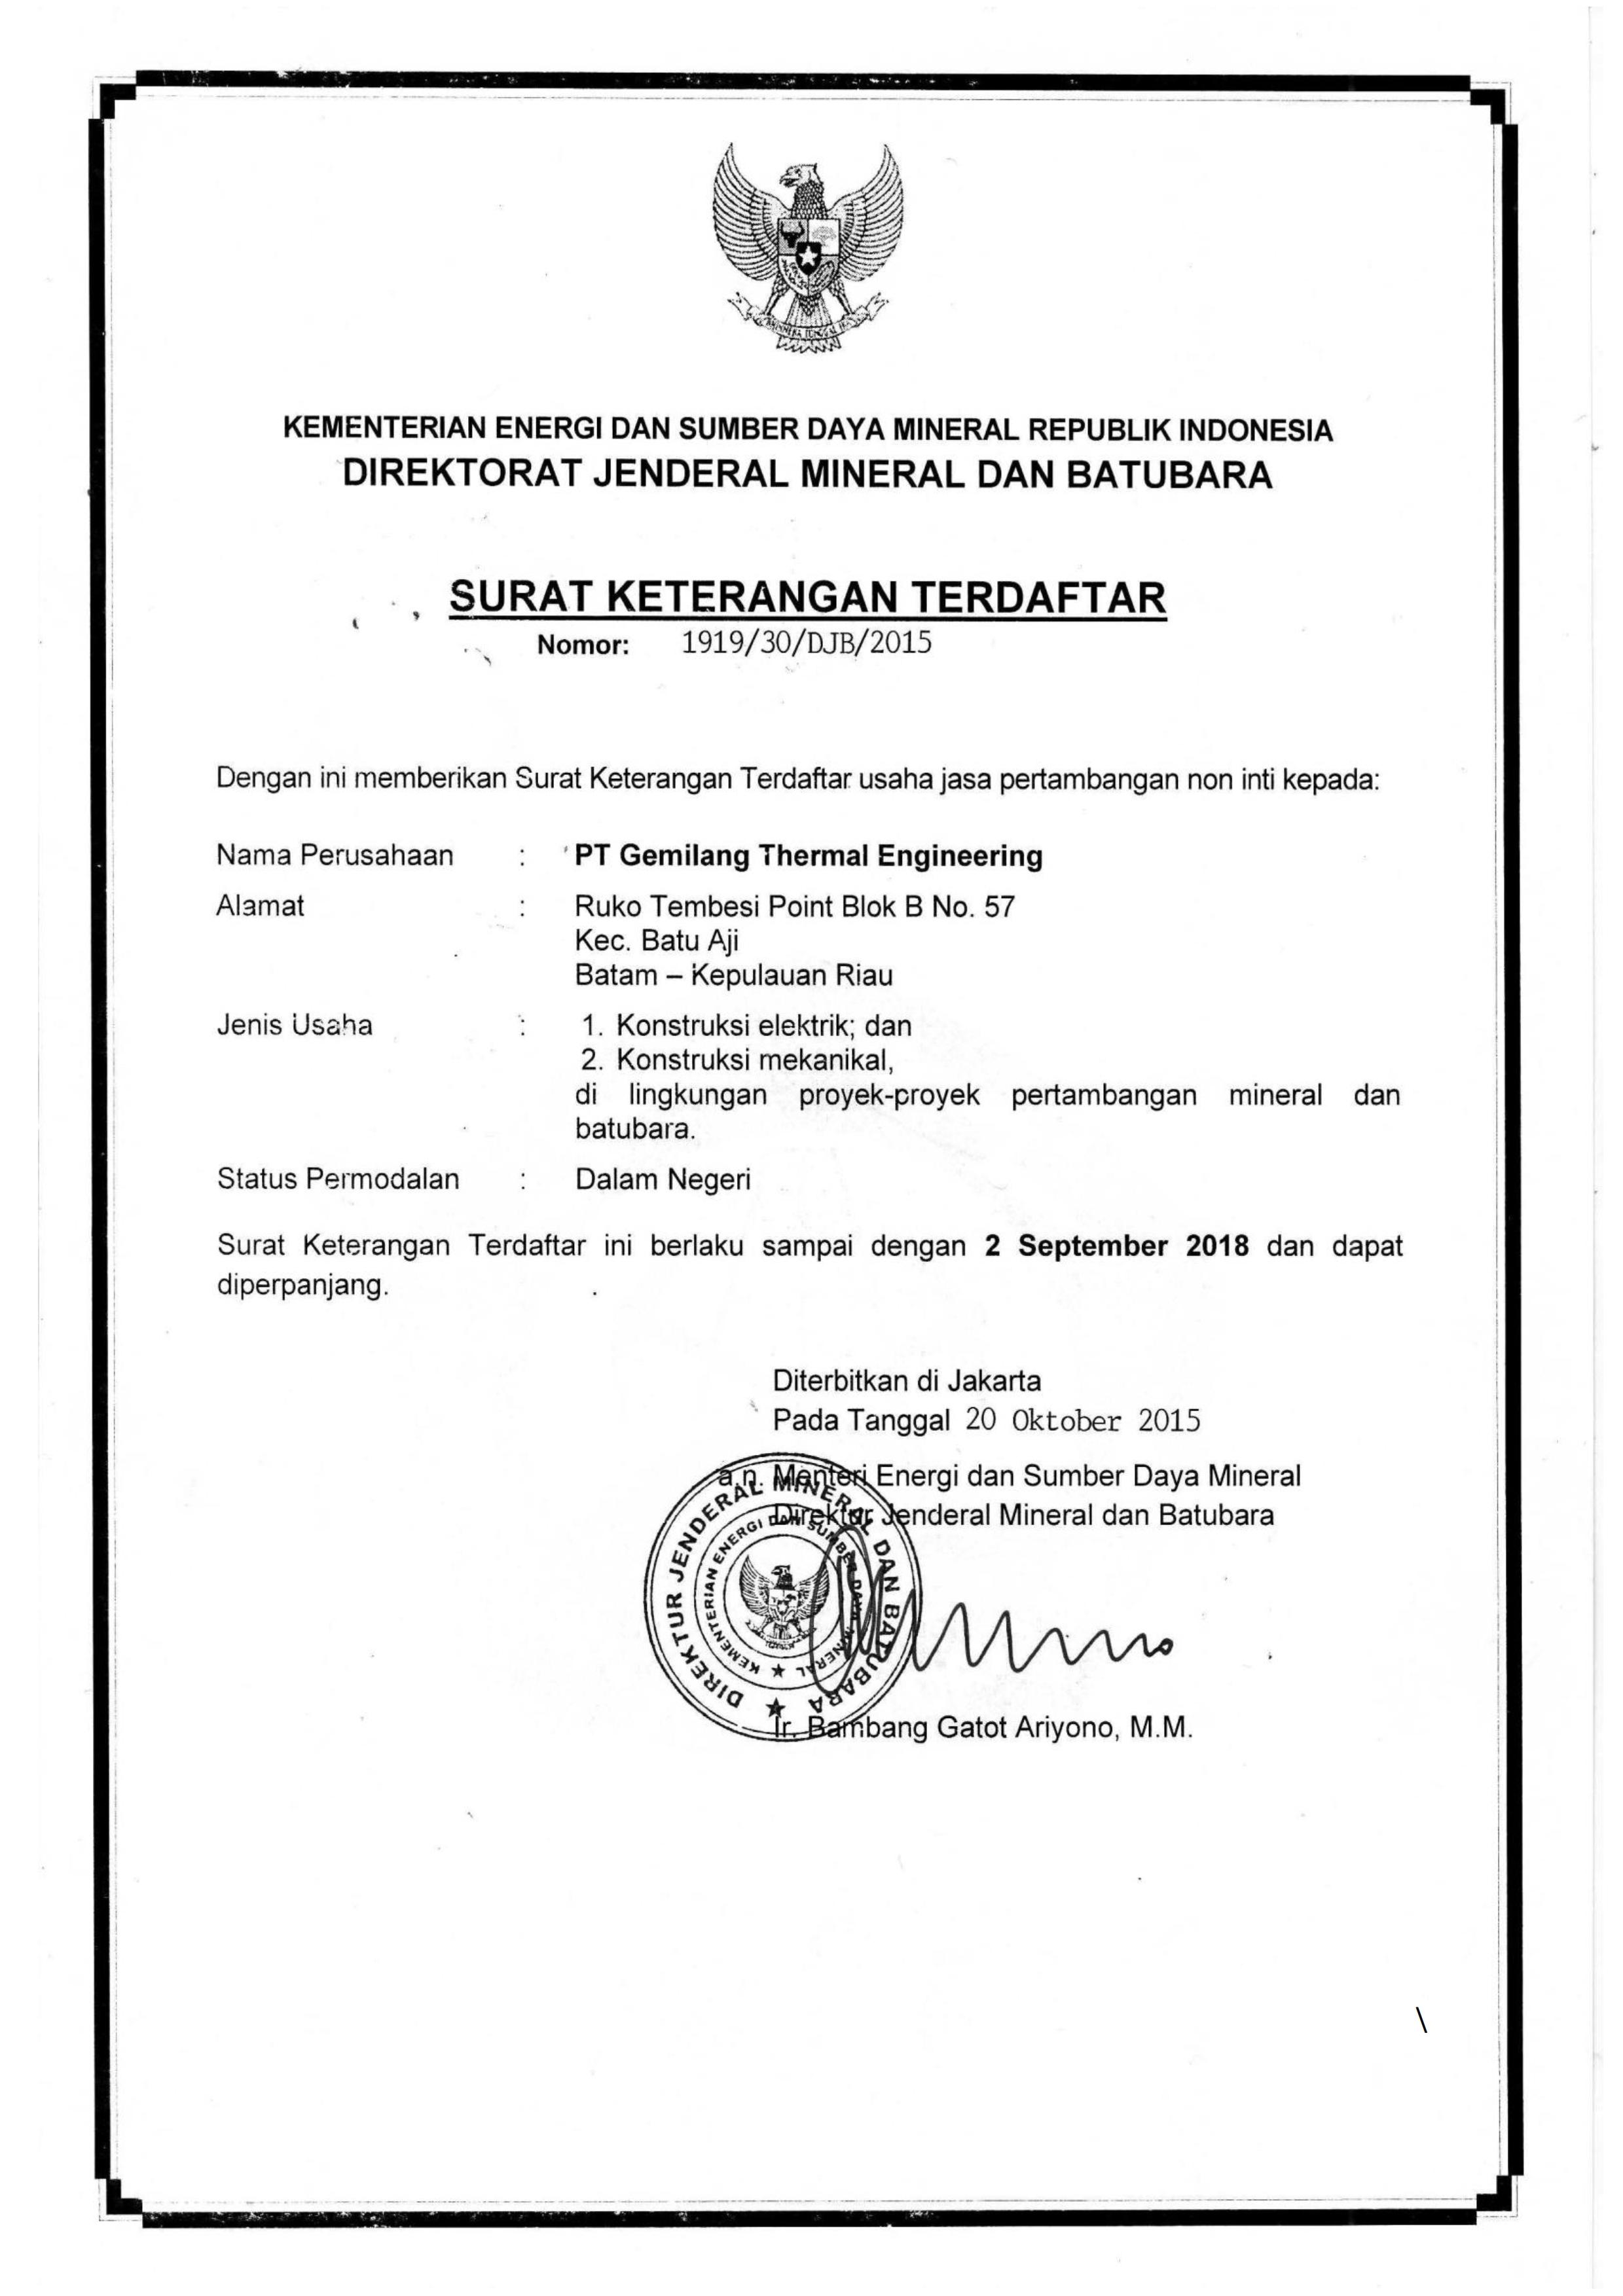 SKT Pertambangan Electrical & Mechanical